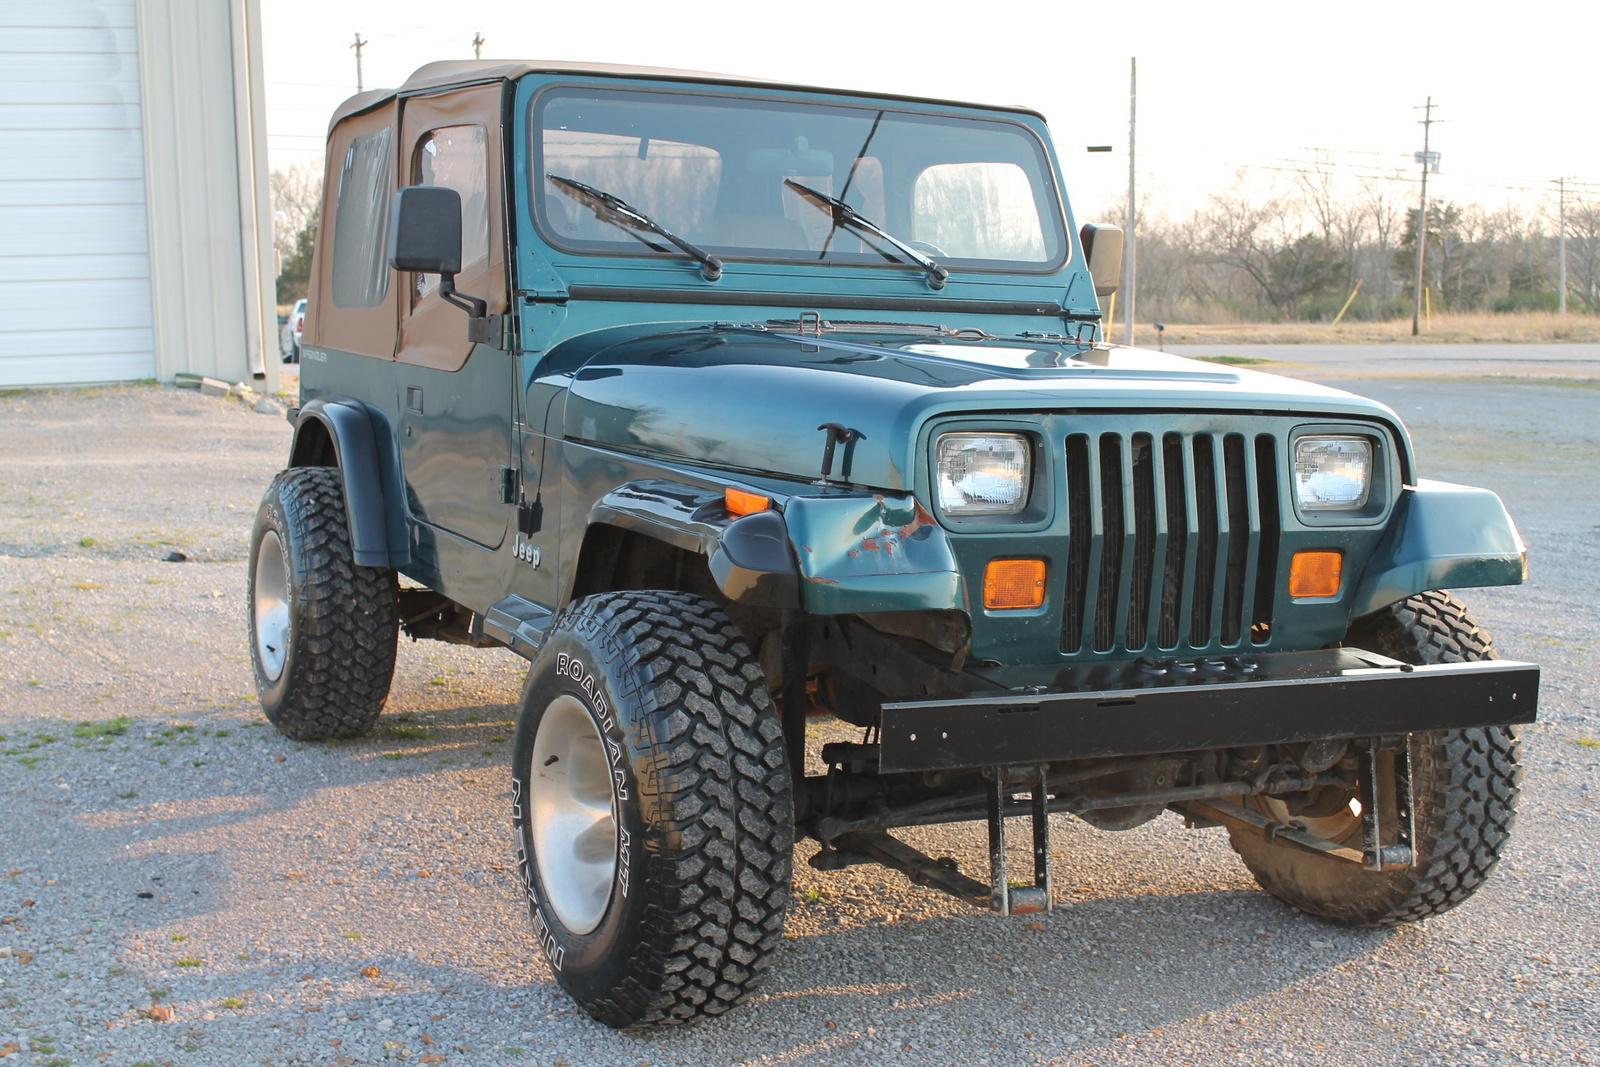 1995 Jeep Wrangler Pictures C2419 as well Sujet55637 as well 1985 Amc Jeep Grand Wagoneer likewise 89 Xj Wagoneer Joe C Beaufort Sc likewise Watch. on 1989 jeep grand cherokee